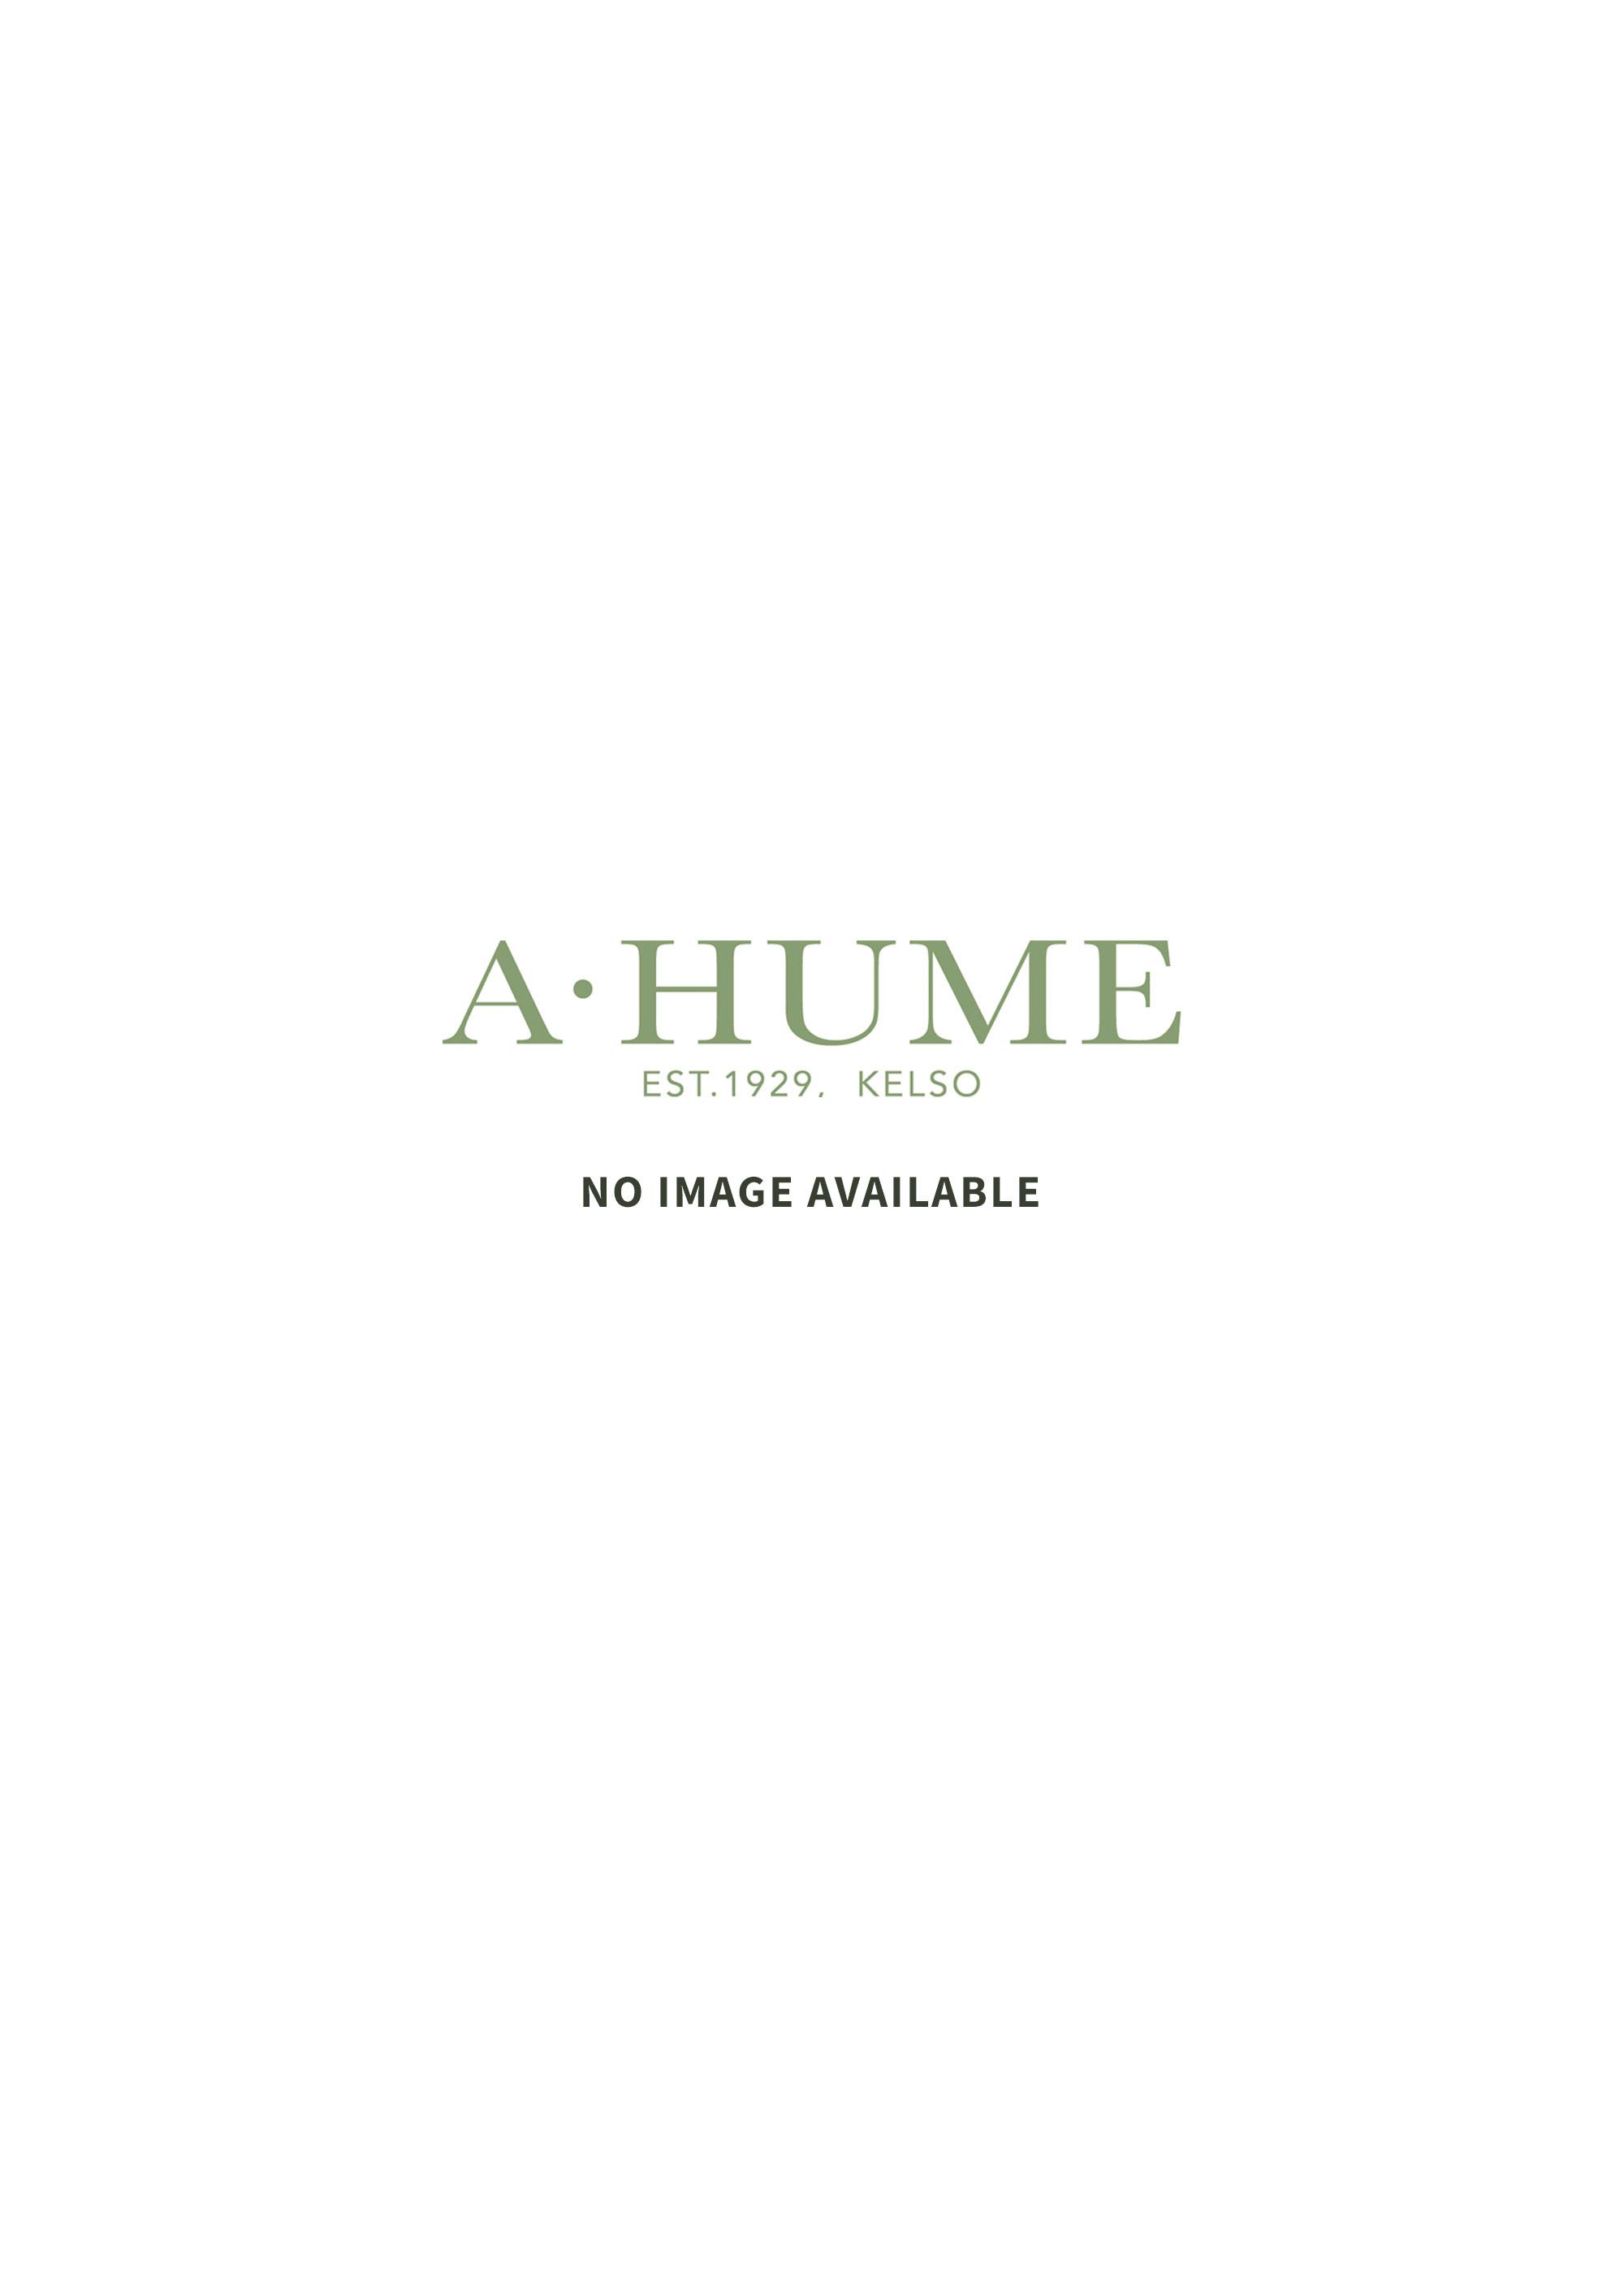 wie man serch groß auswahl kaufen Brax Perma Jean - Mens from A Hume UK